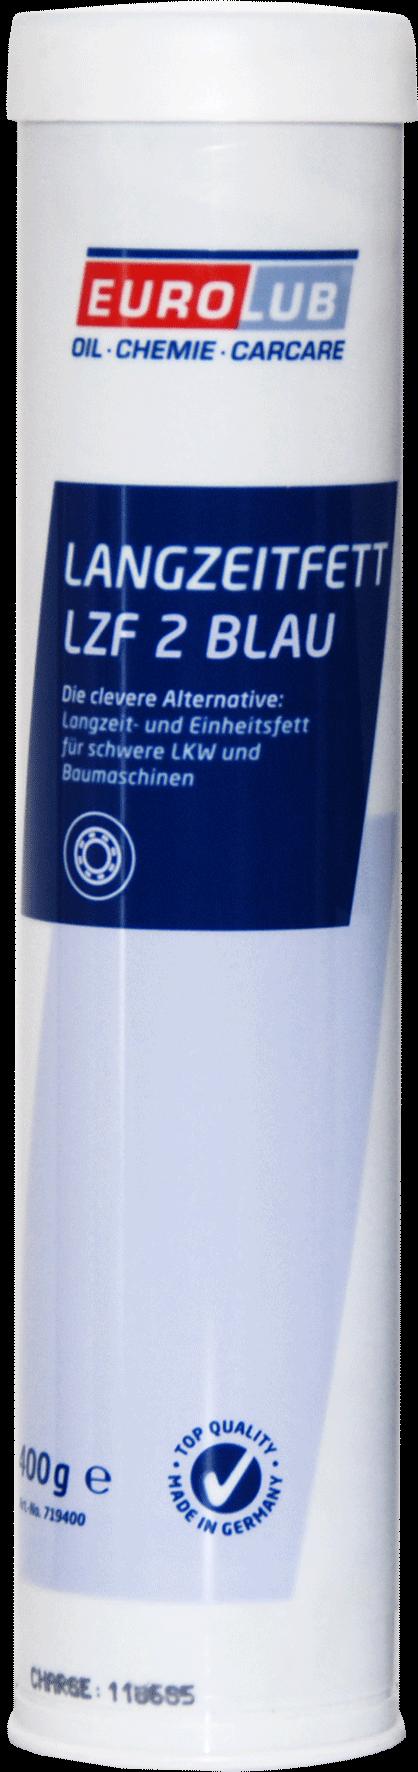 EUROLUB Langzeitfett LZF 2 blau (универсальная смазка), 0.4л